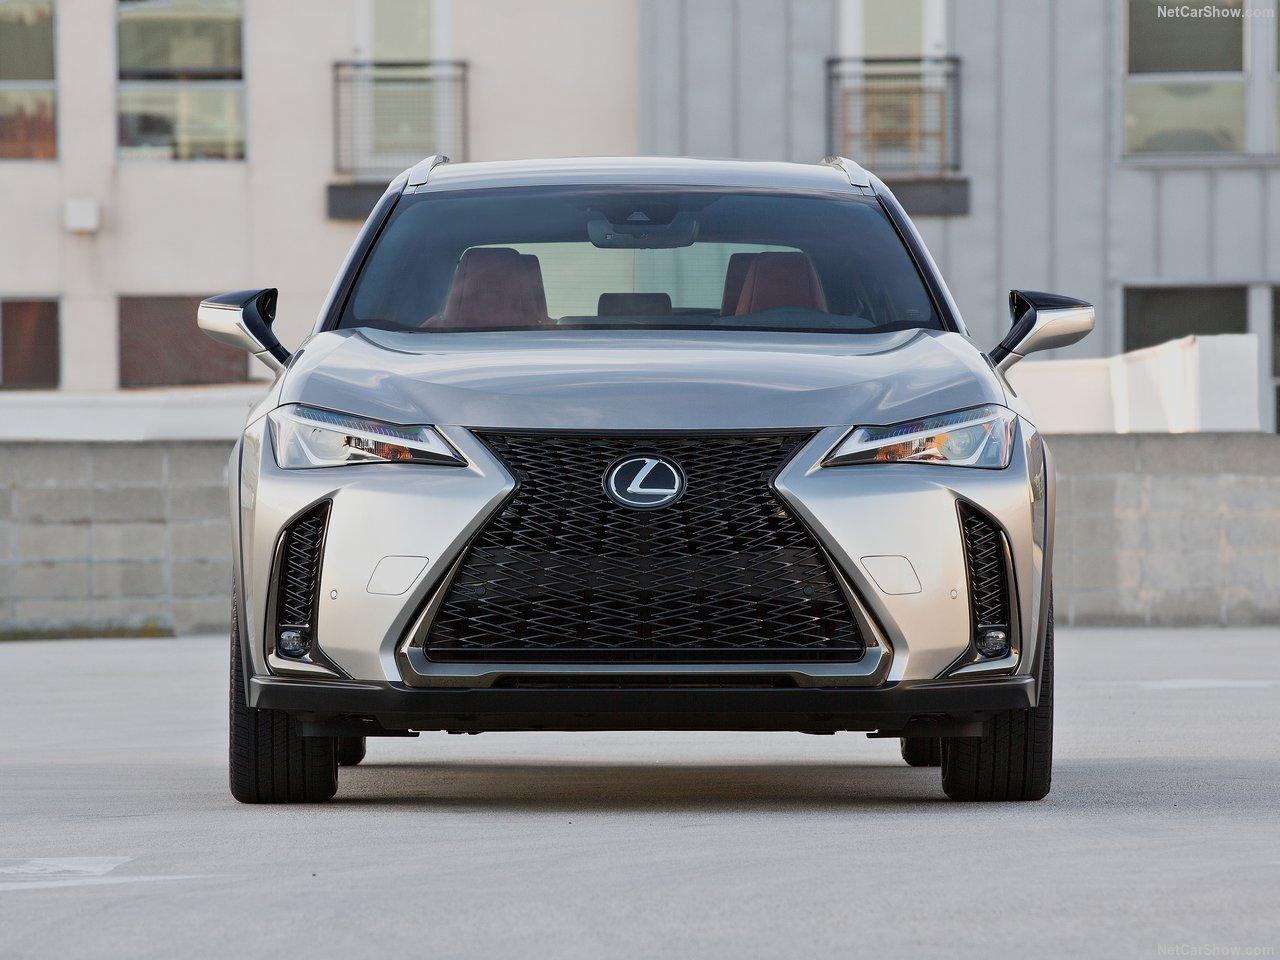 Lexus-UX-2019-1280-15.jpg